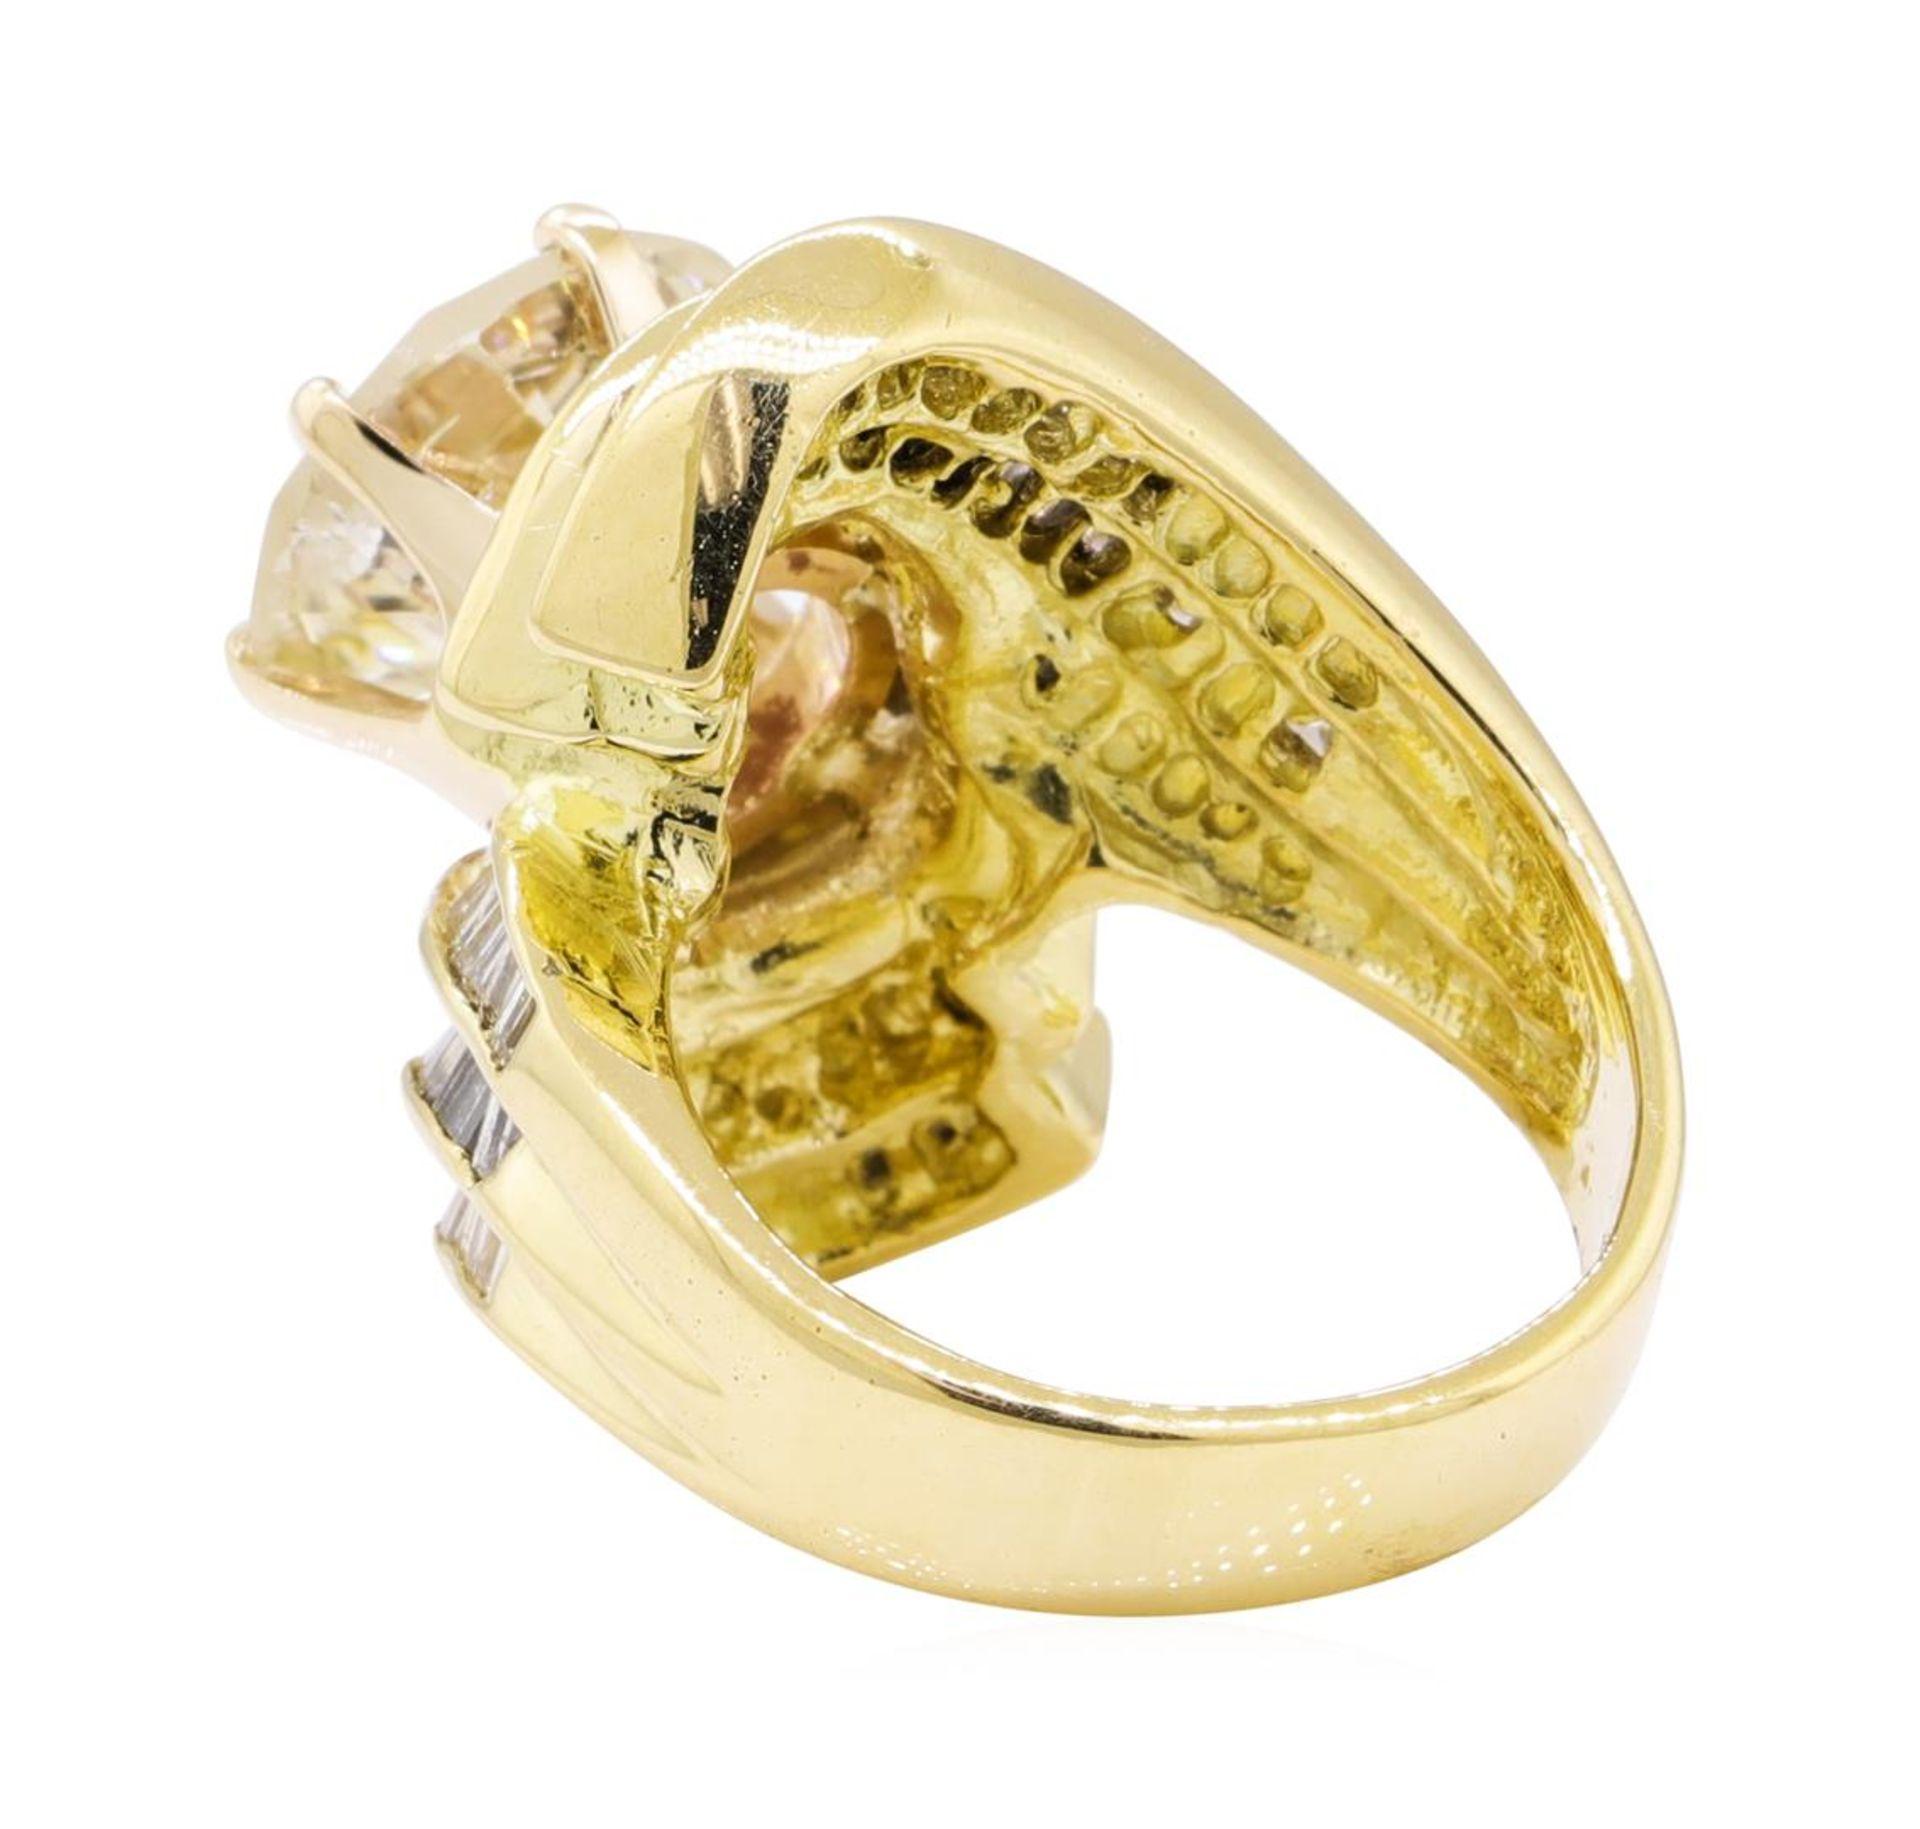 7.51 ctw Diamond Ring - 18KT Yellow Gold - Image 3 of 5